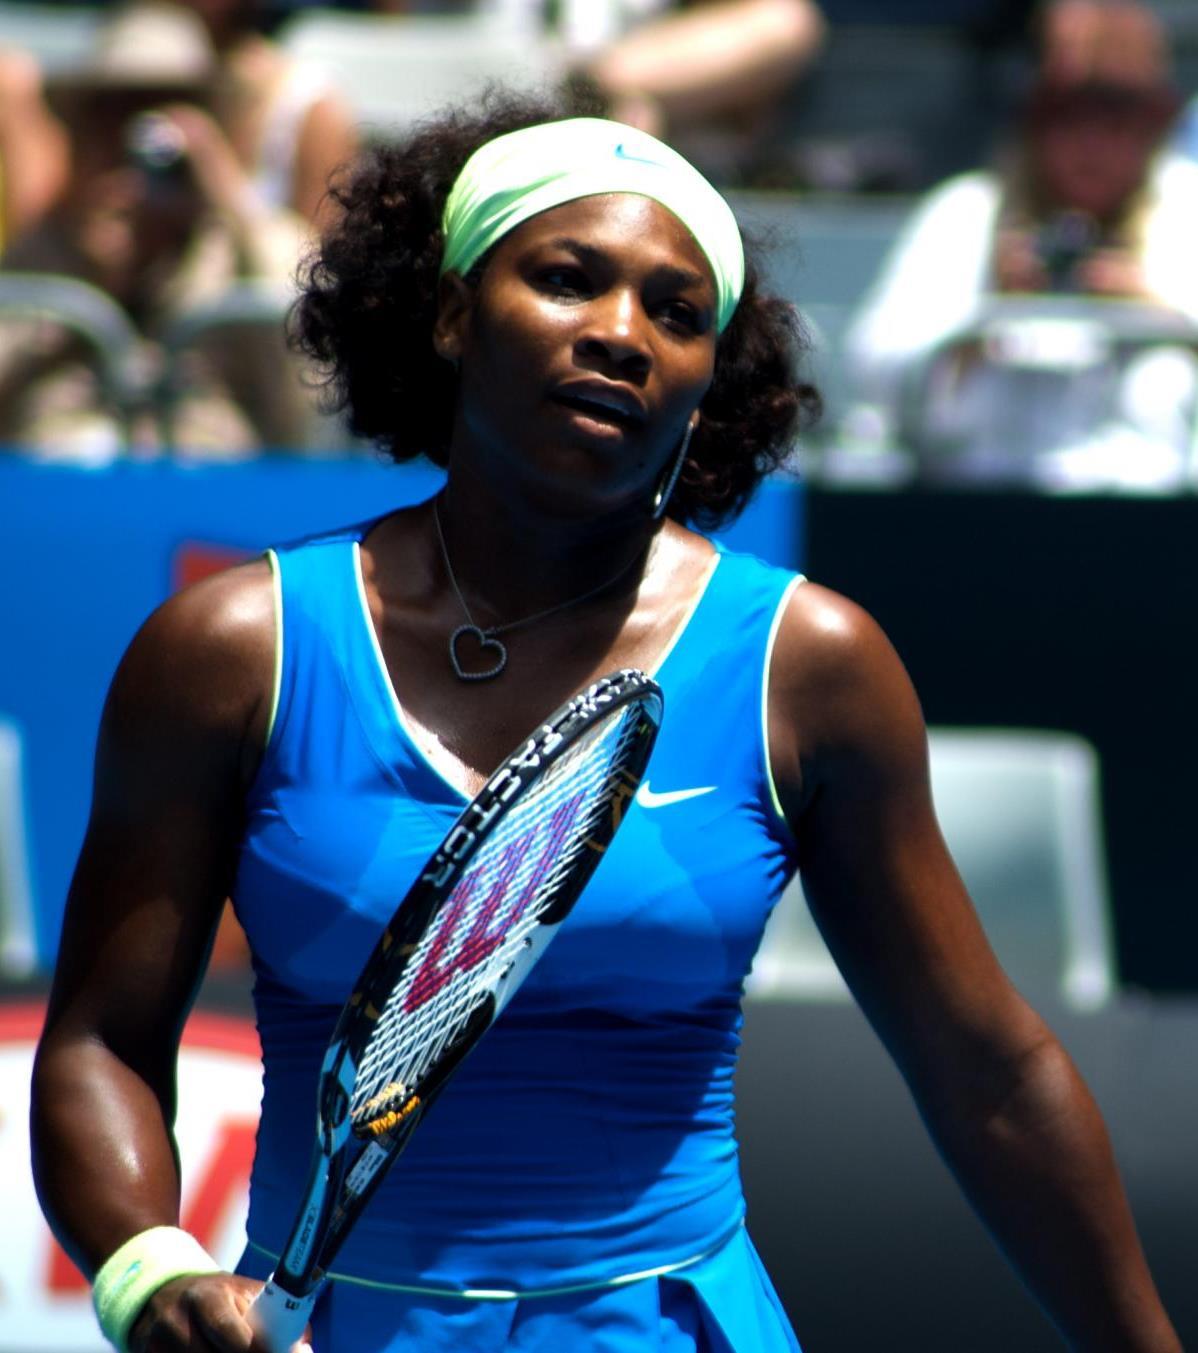 http://2.bp.blogspot.com/_qA0gY4wKPm8/TDEK2_jDsMI/AAAAAAAAA1s/XhFV2hE9JWE/s1600/Serena_Williams.jpg